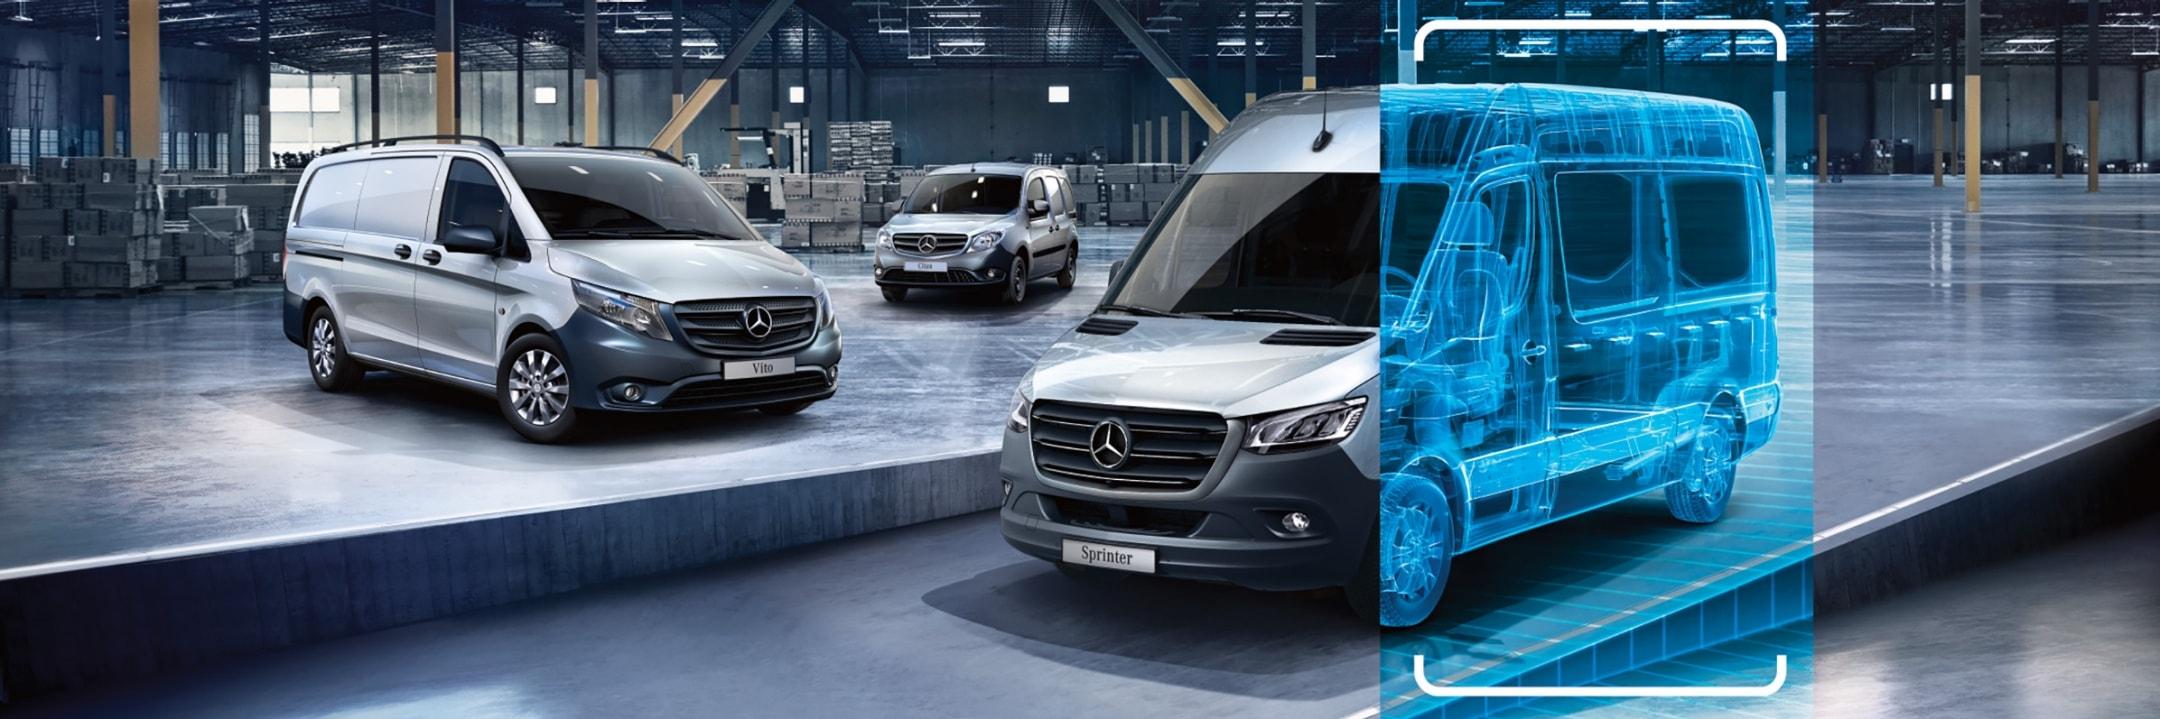 utilitaires-occasions-Mercedes-Benz-Car-Avenue-01